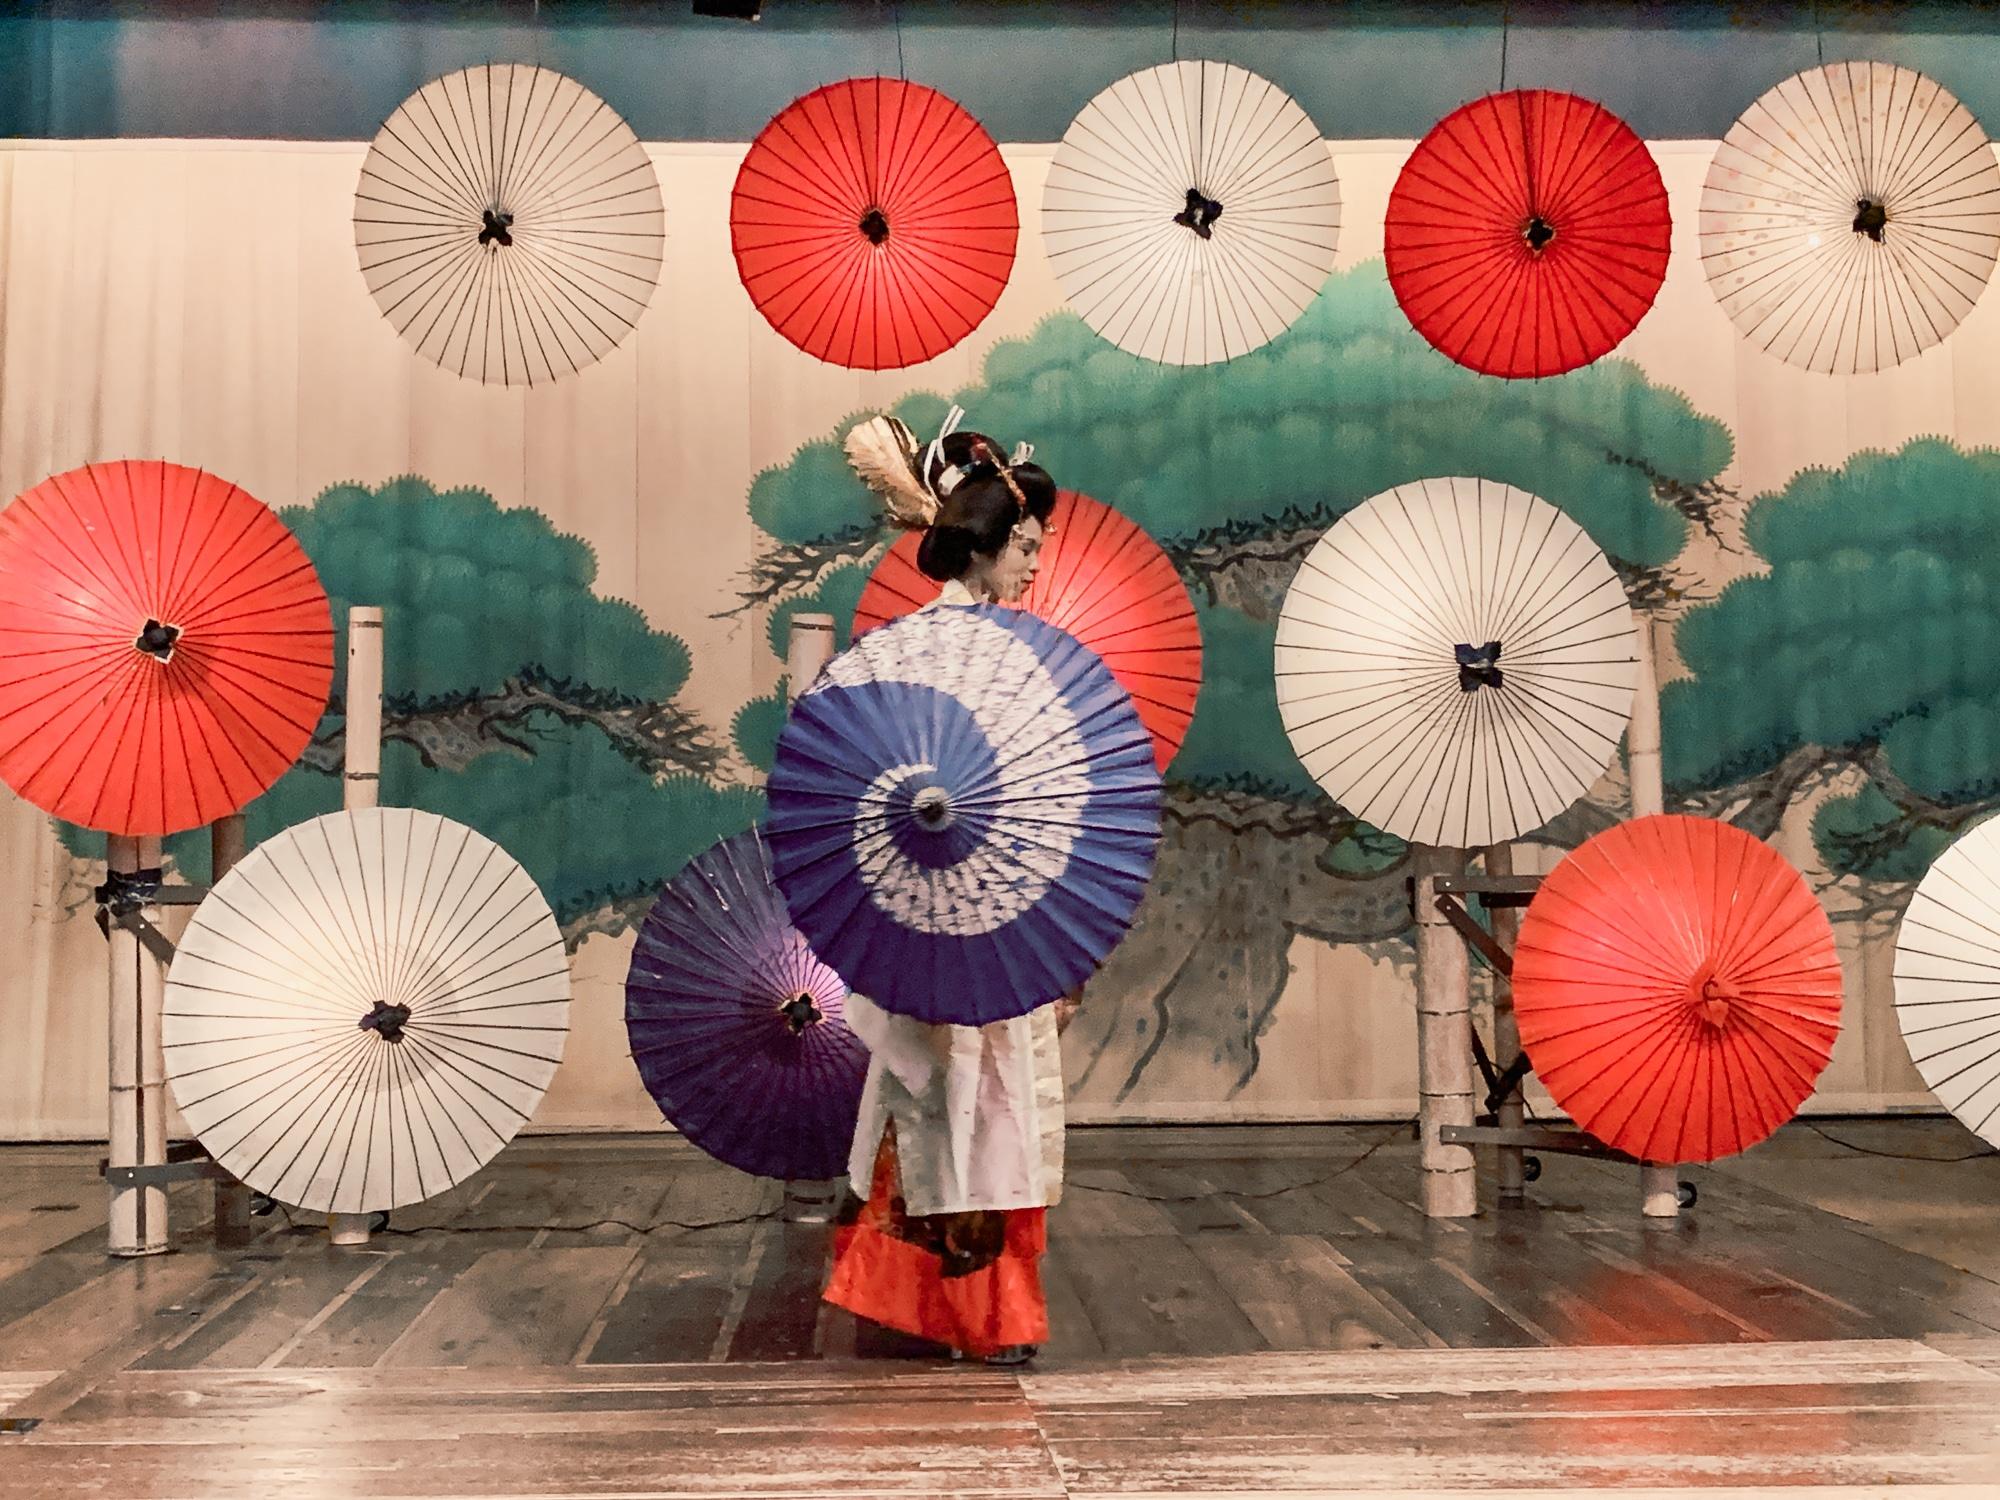 Kyushu Rundreise: Reisetipps, Onsen und Highlights in Japans Süden - Yachiyoza Theater Yamaga